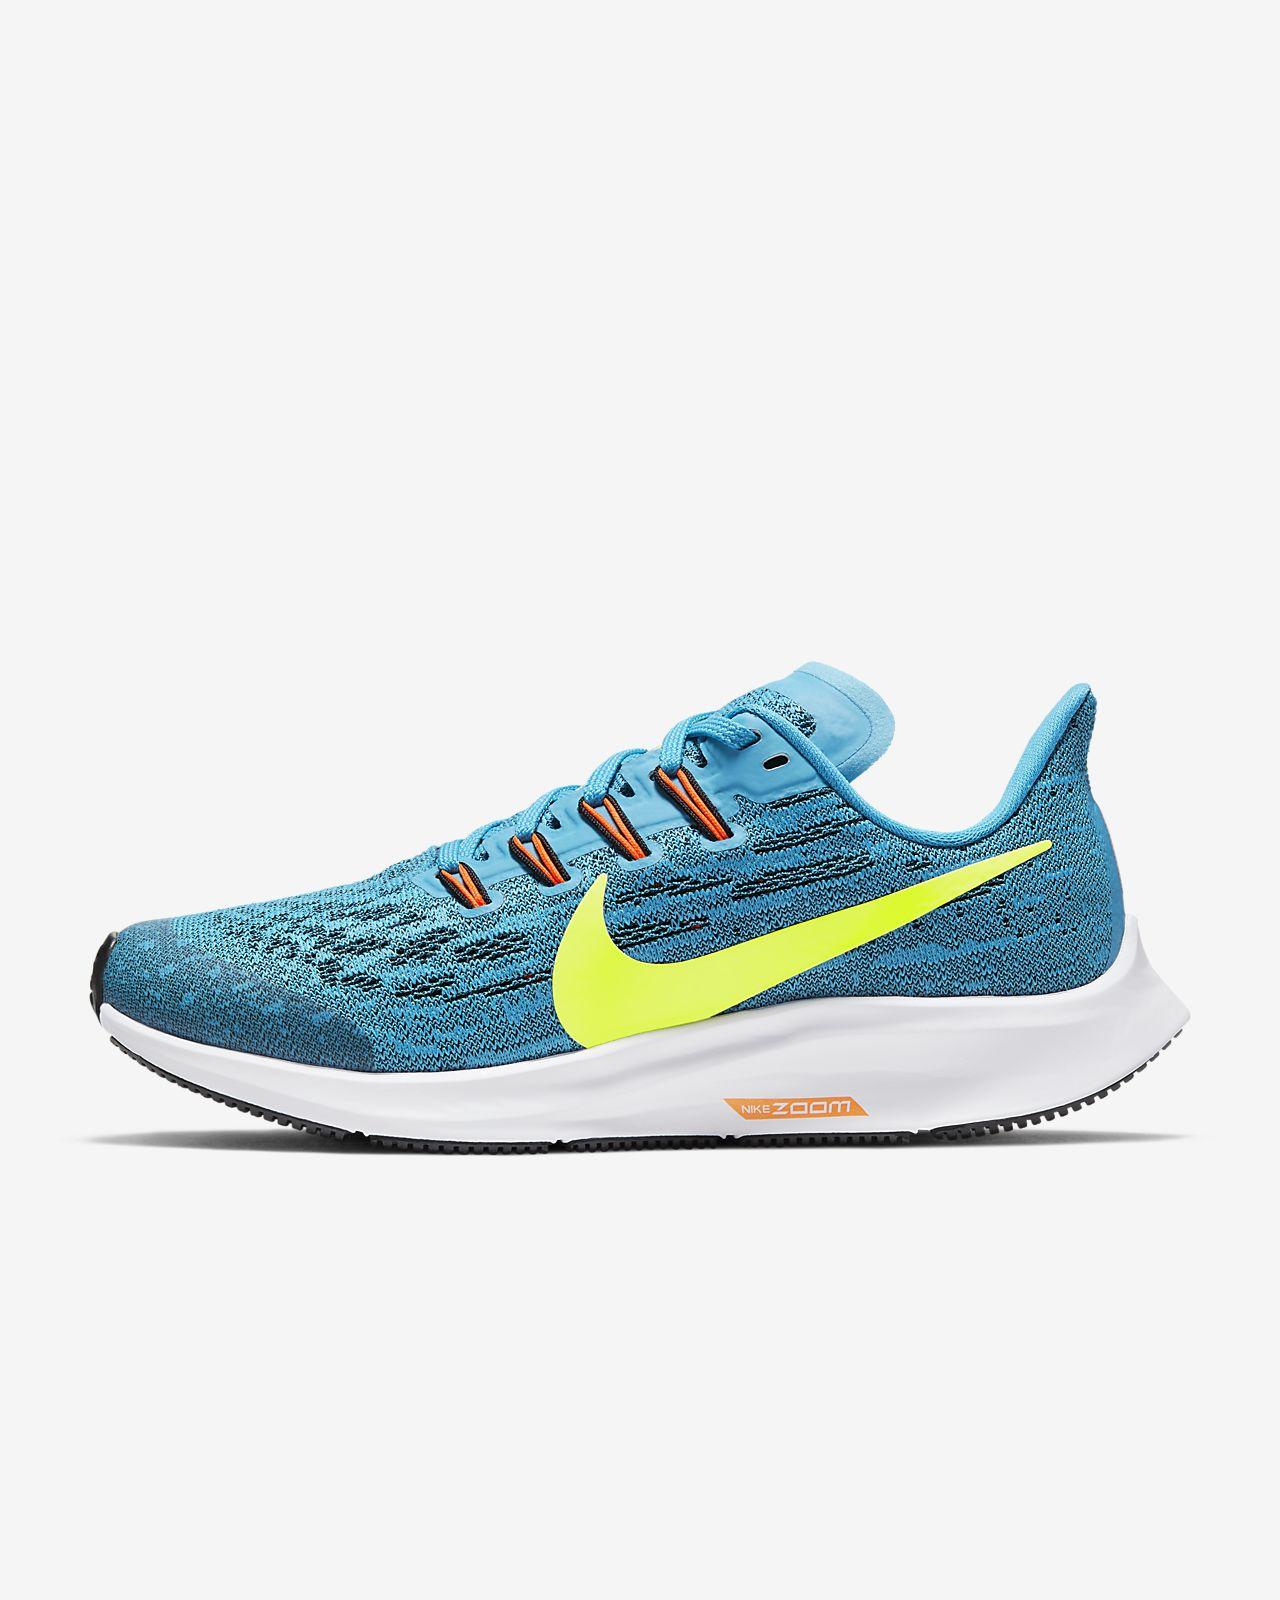 Older Kids' Running Shoe by Nike Air Zoom Pegasus 33 With